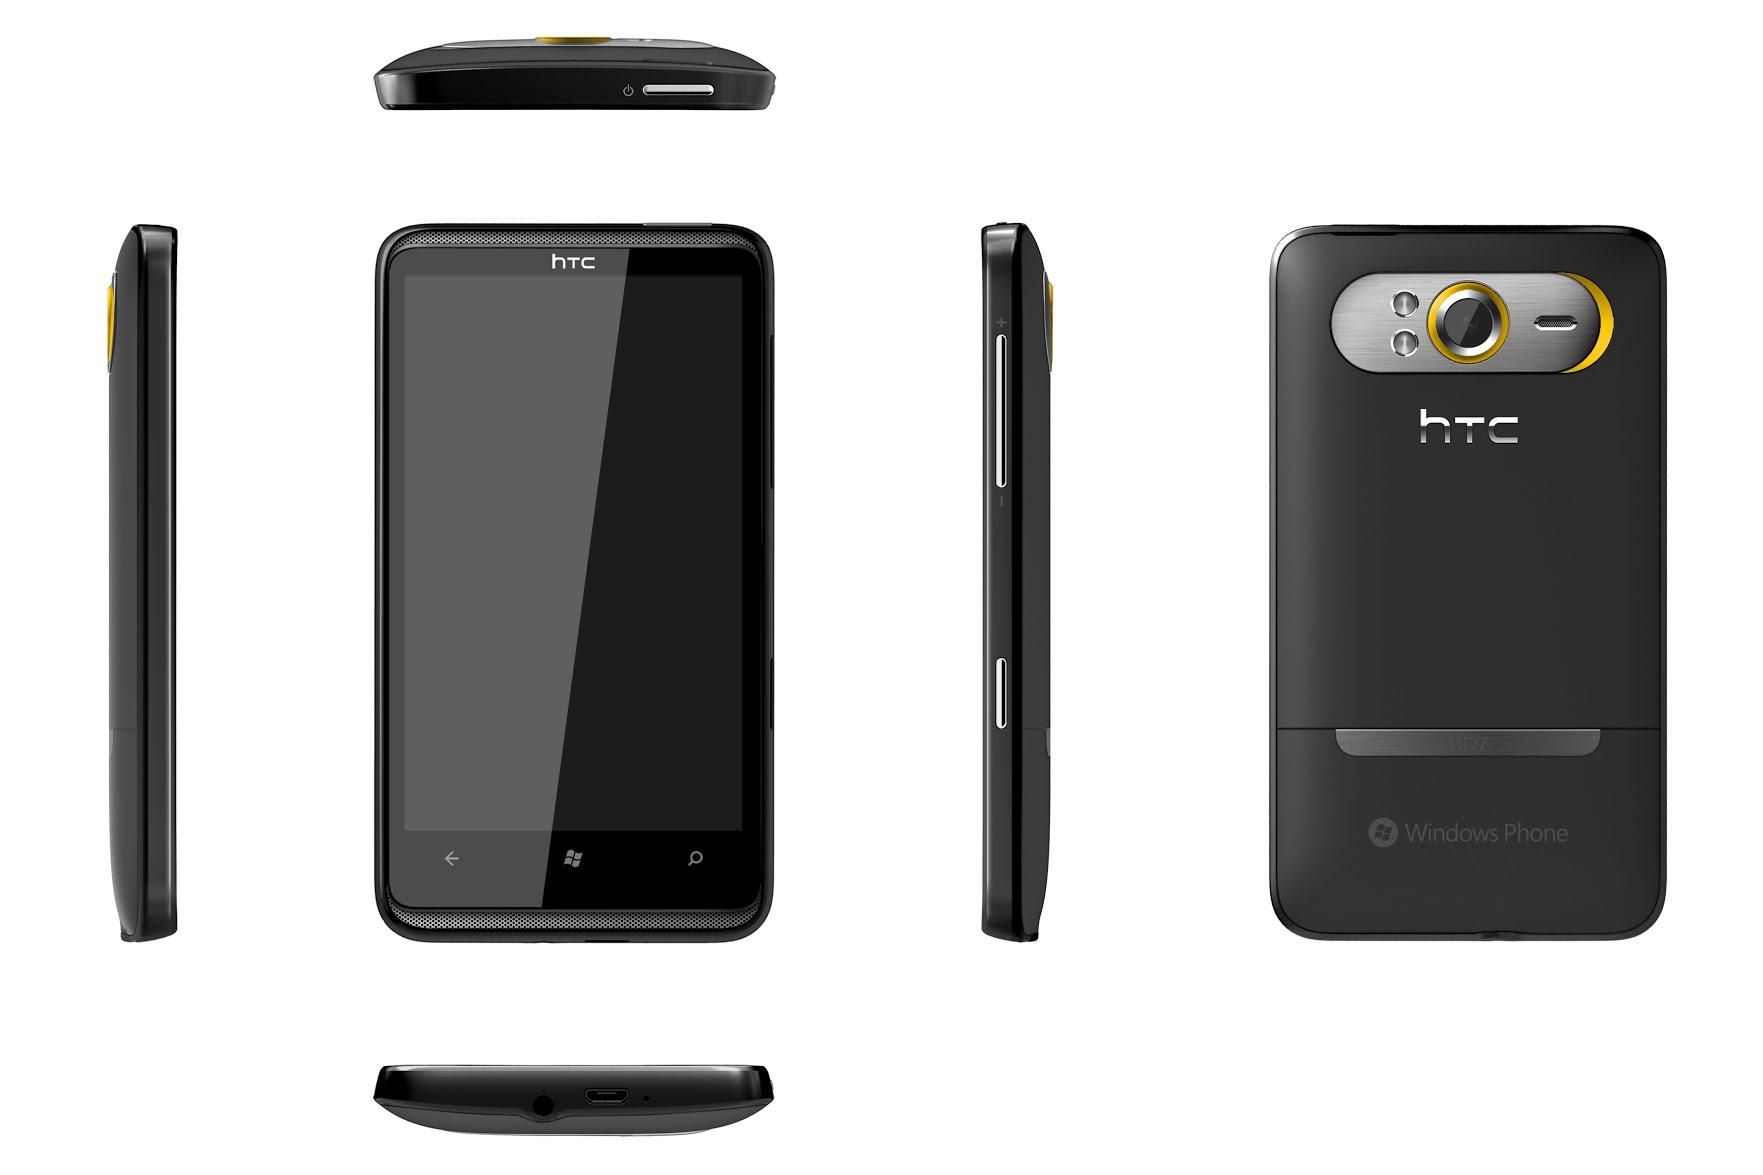 Body HTC HD7